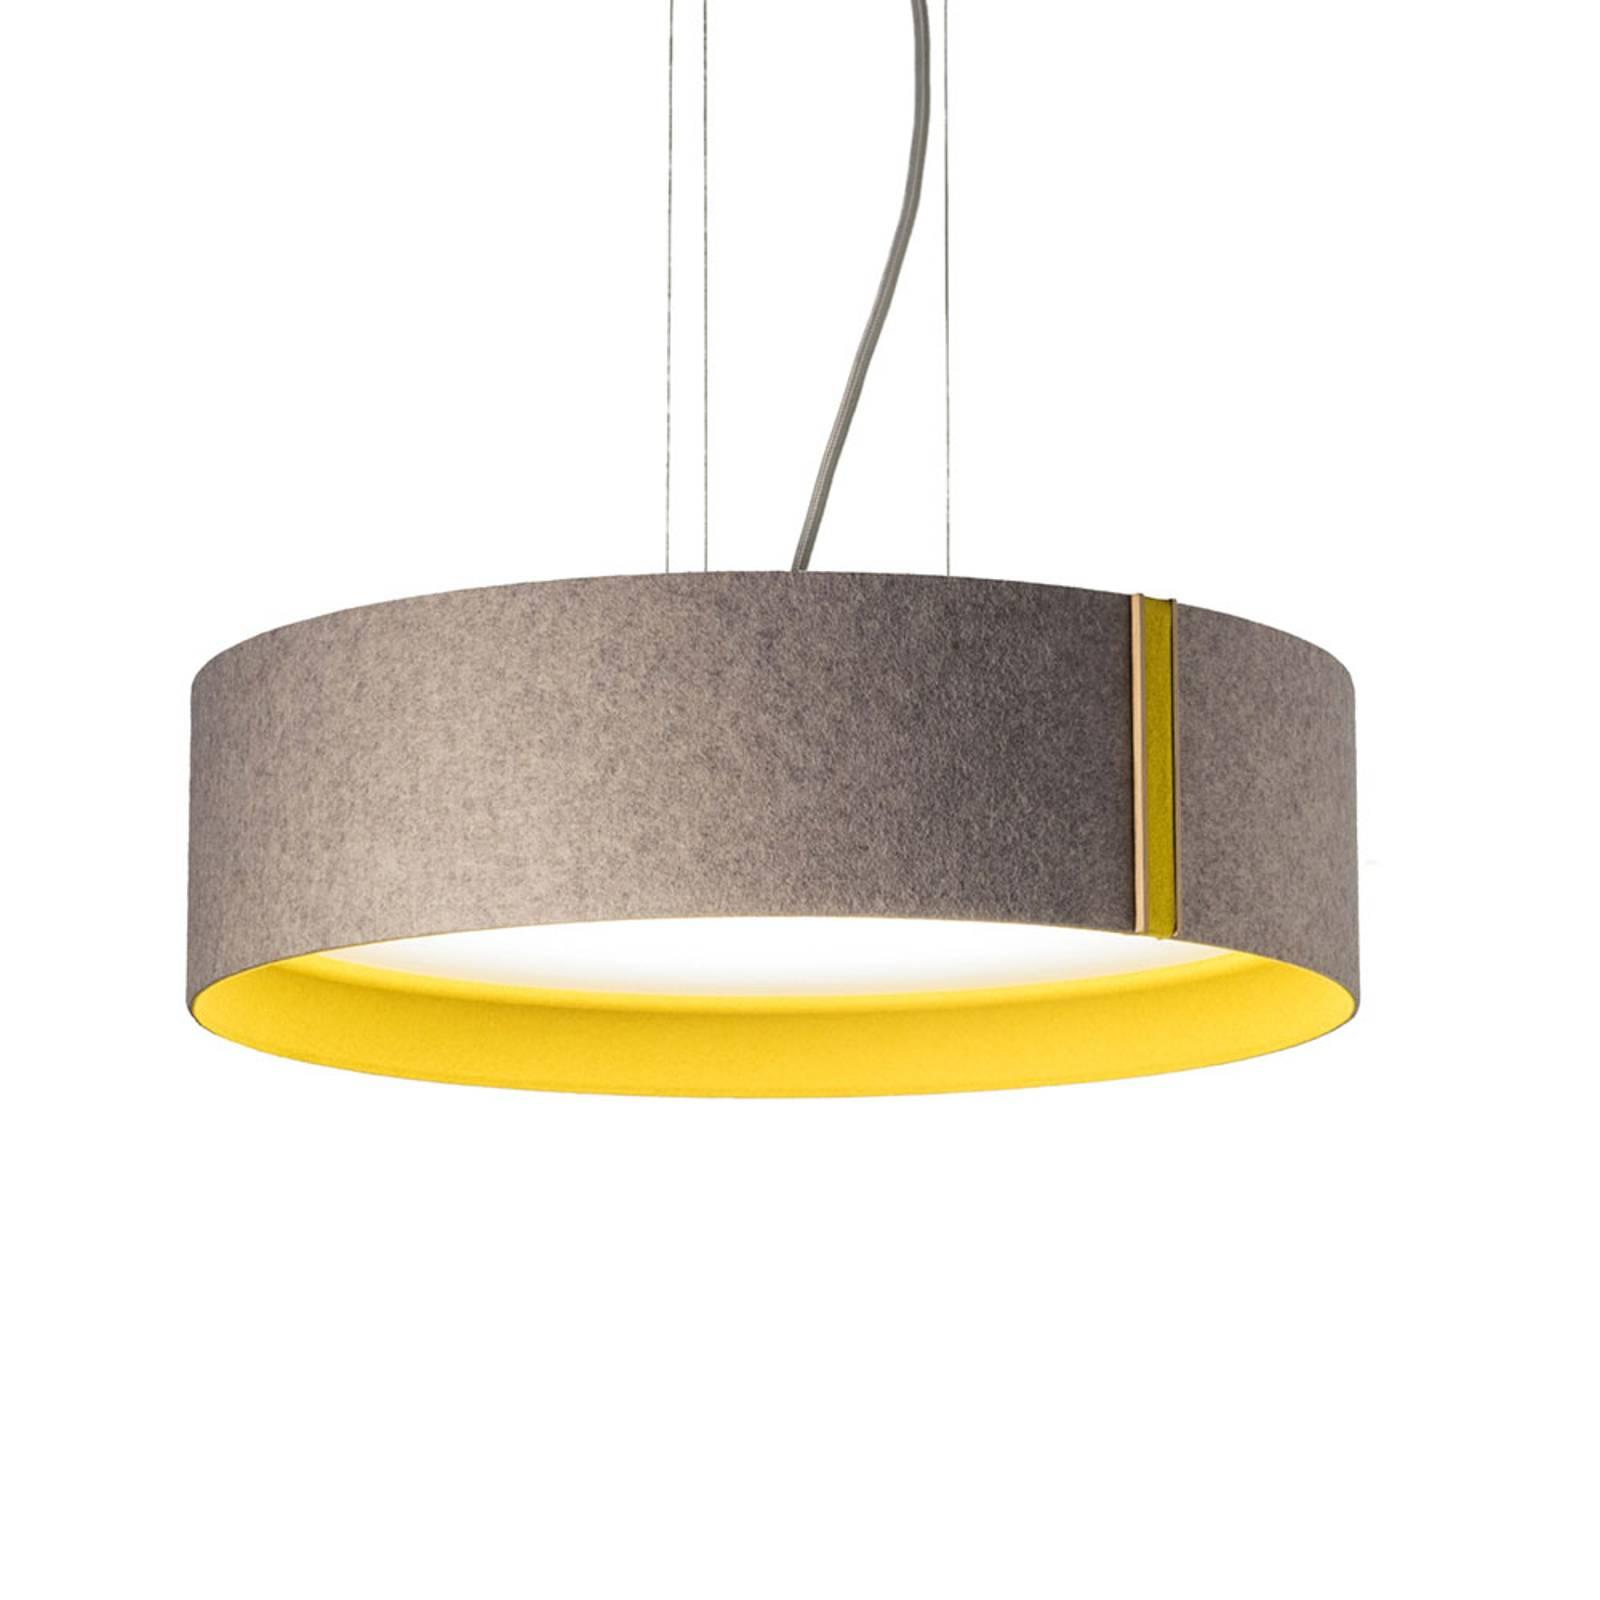 Suspension LED LARAfelt M, Ø43cm, gris/curry